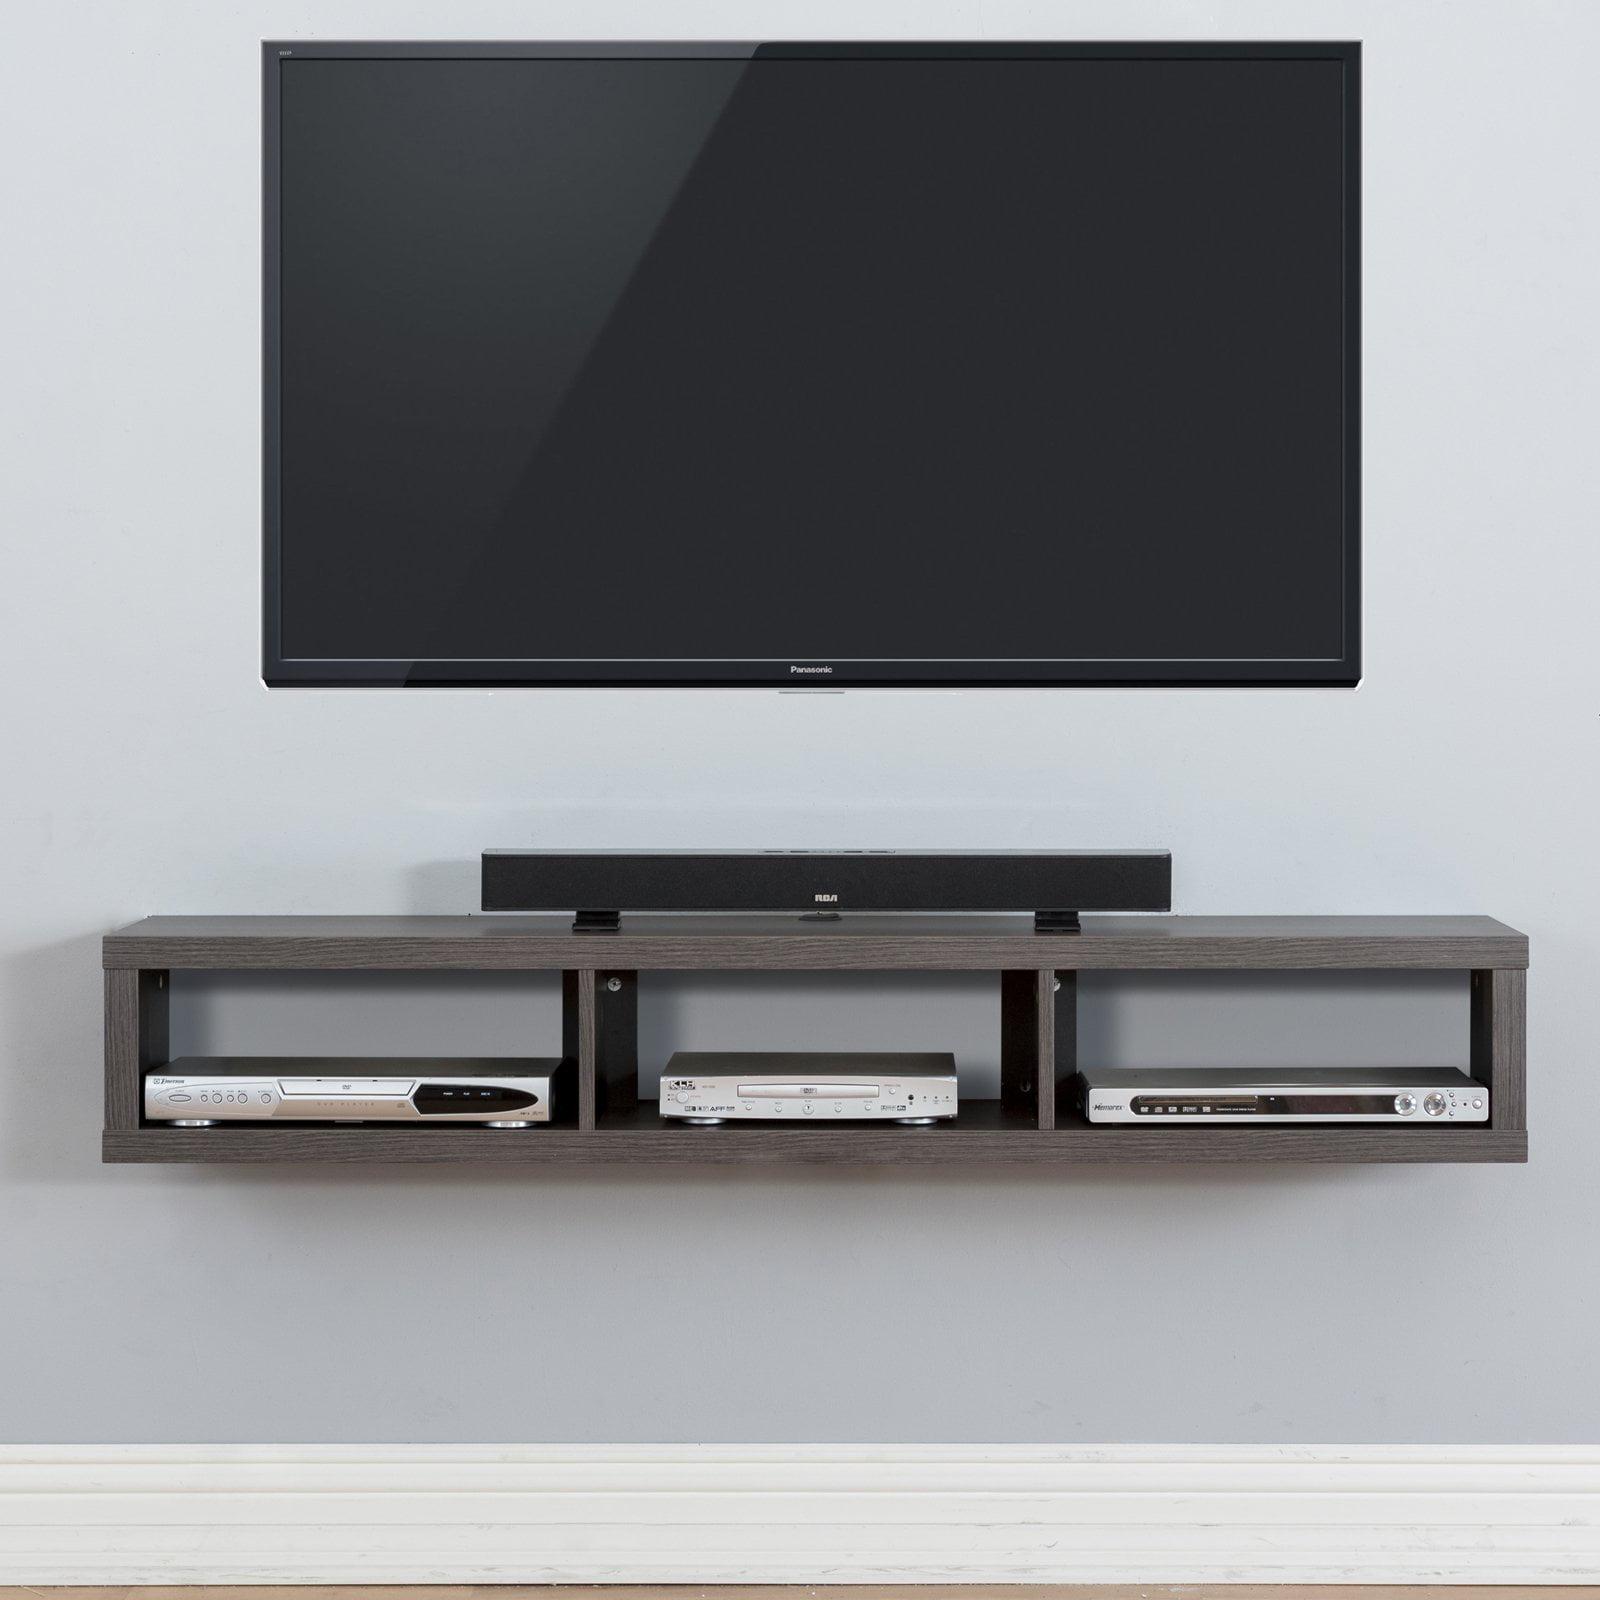 Martin Furniture Shallow Wall Mounted TV Shelf - Walmart.com